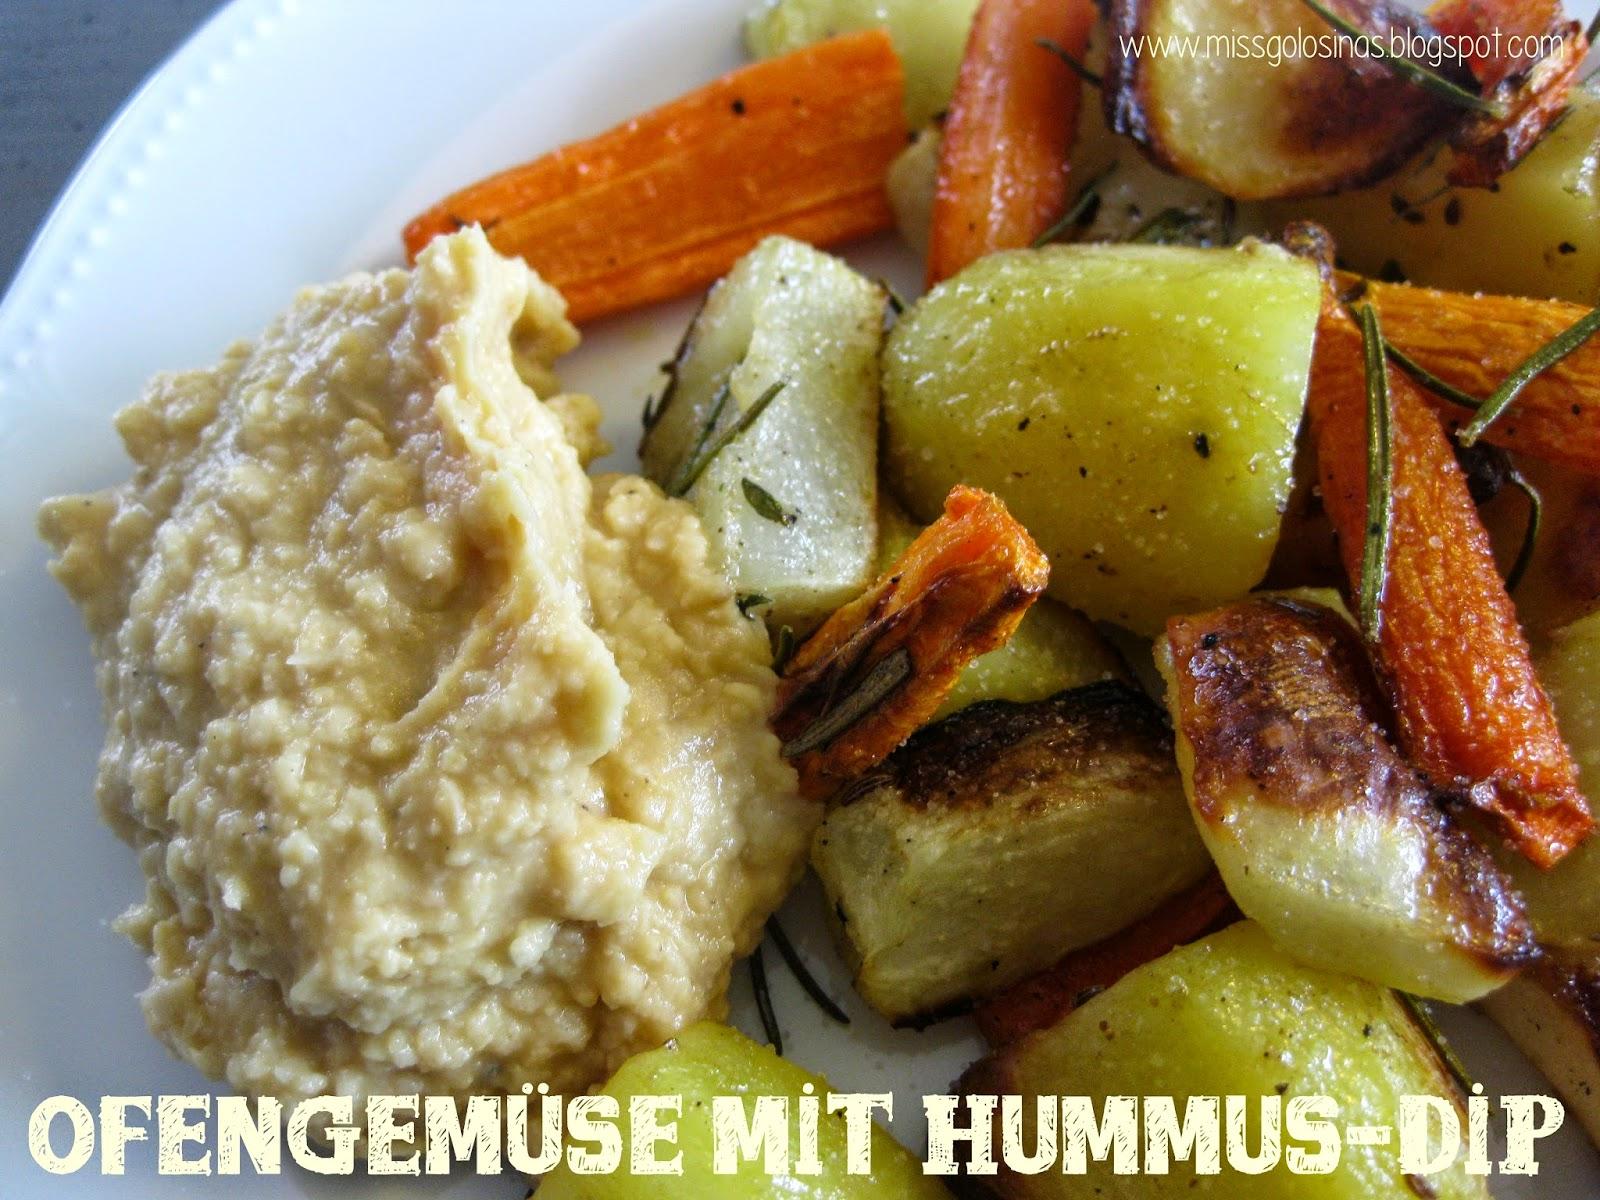 verduras al horno con Hummus, oven vegetables